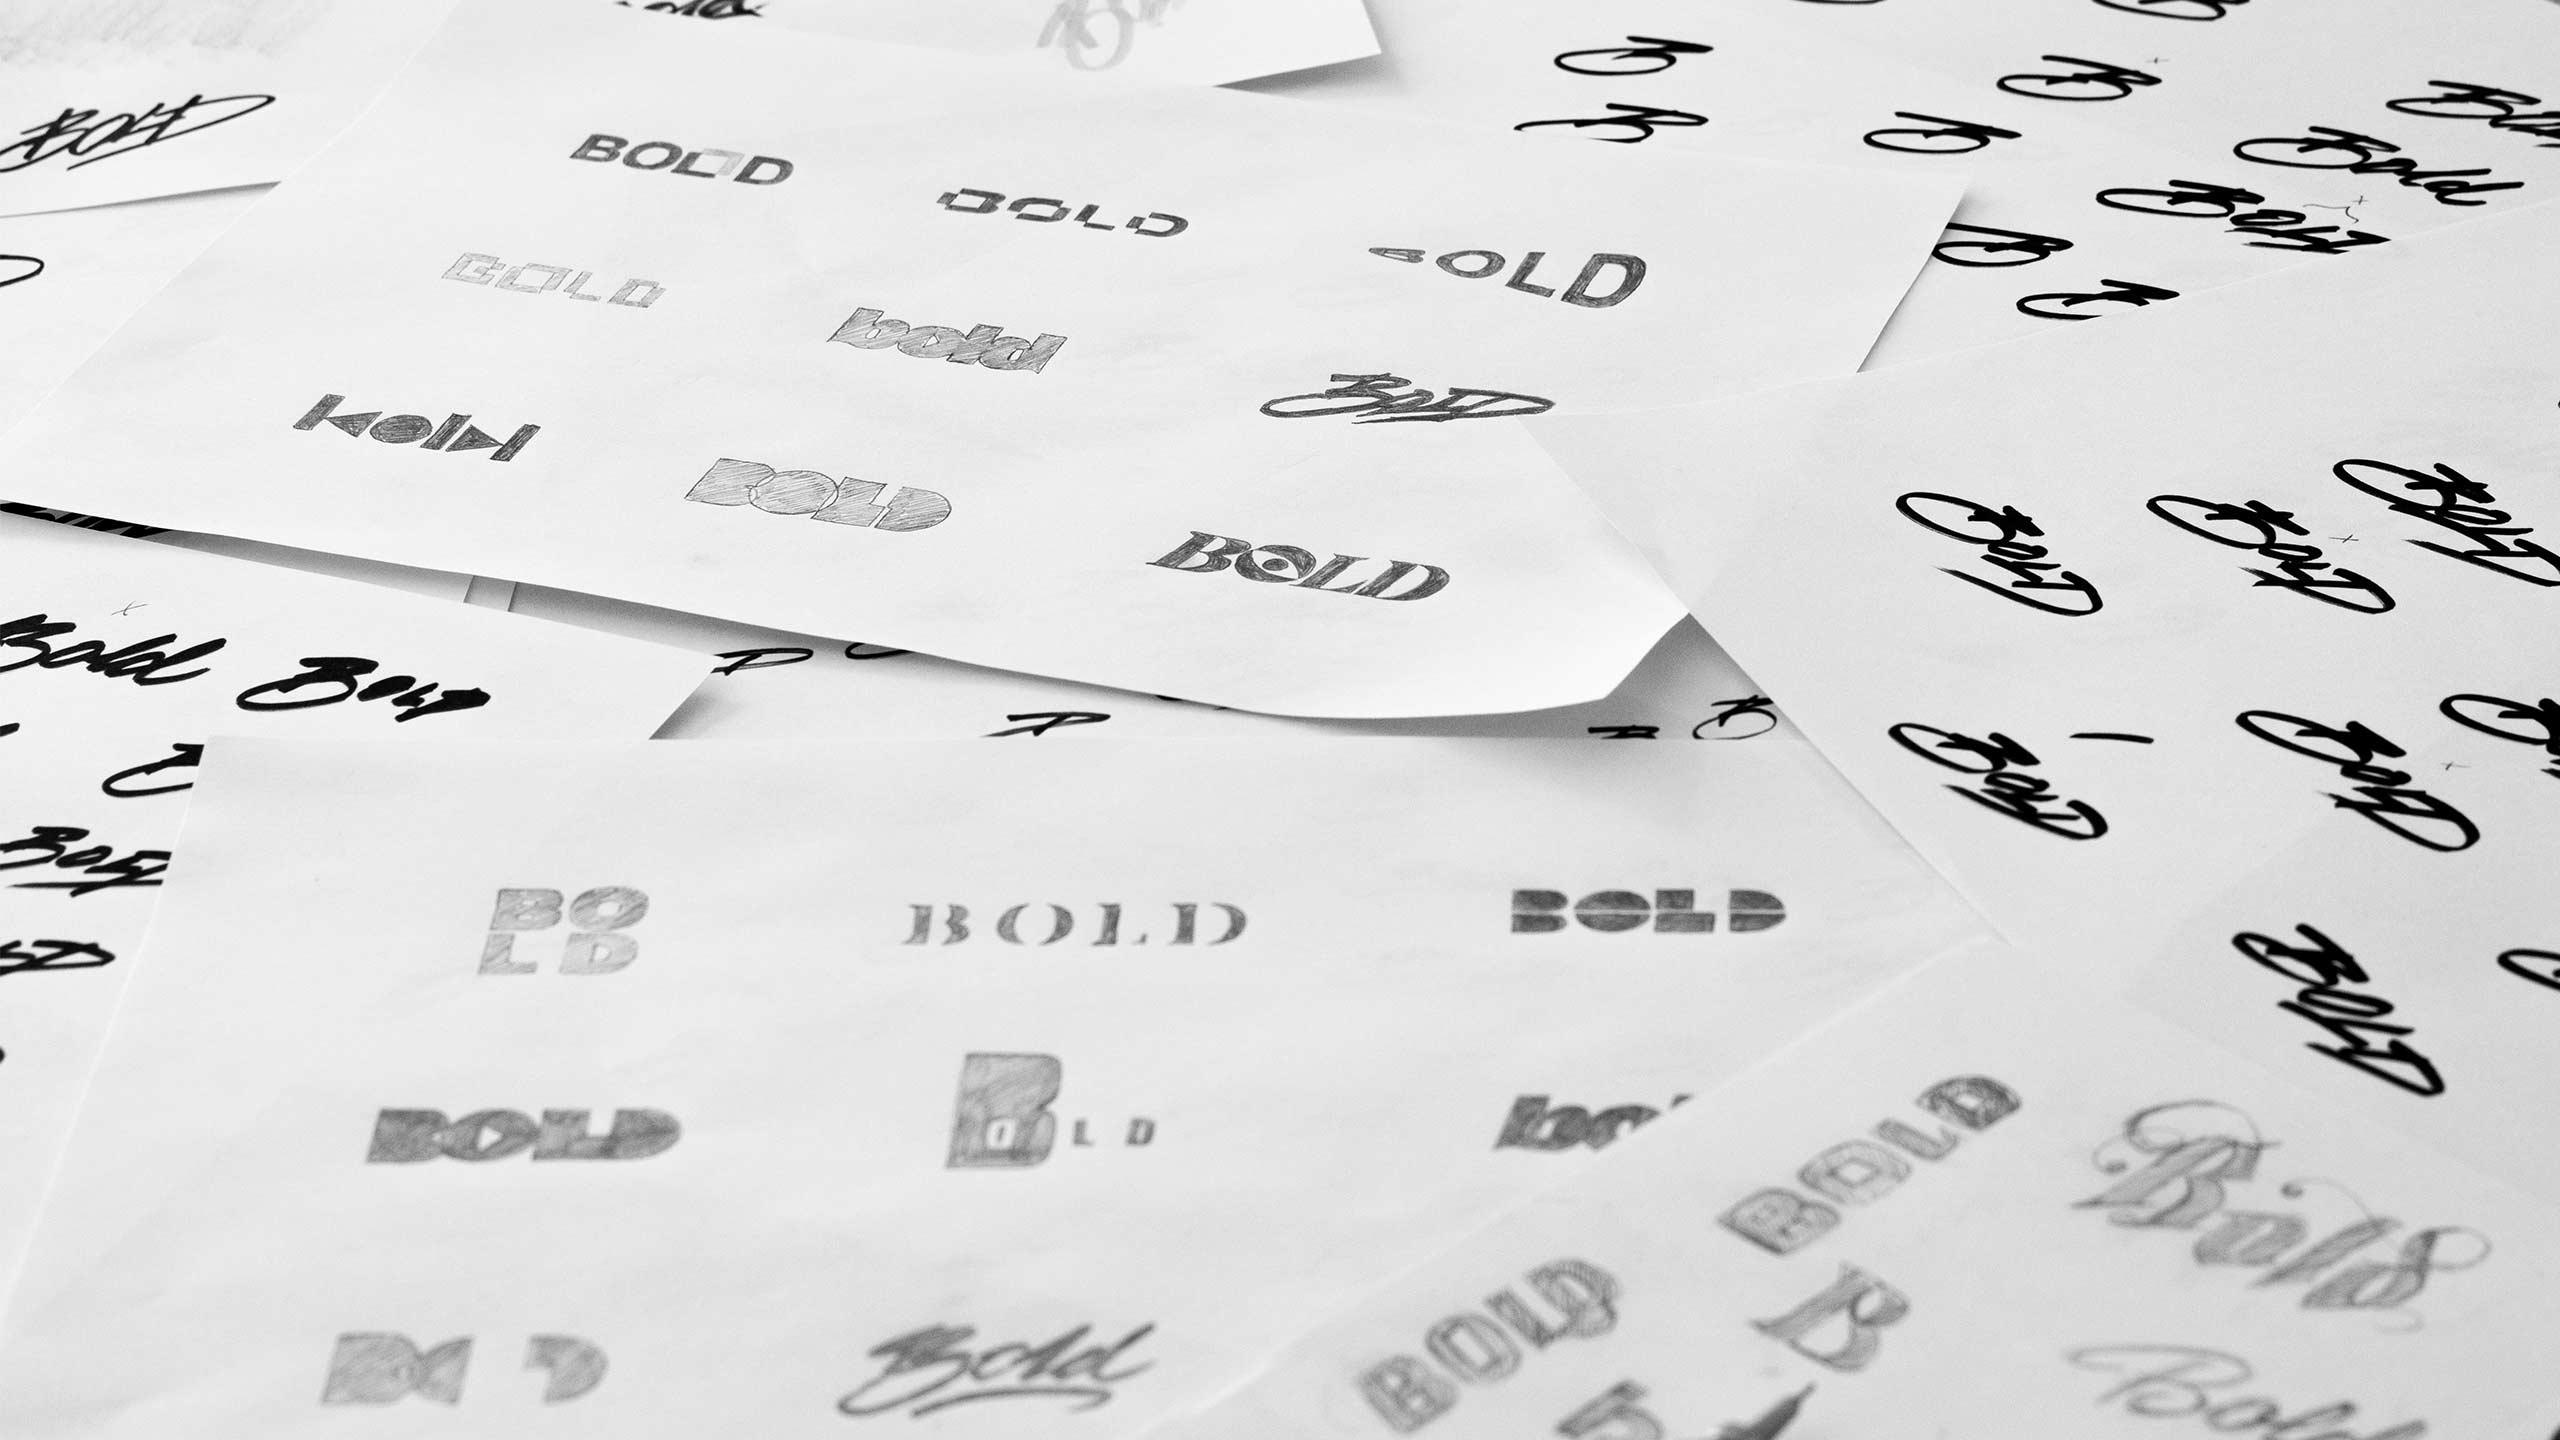 Logo design sketches for Bold.